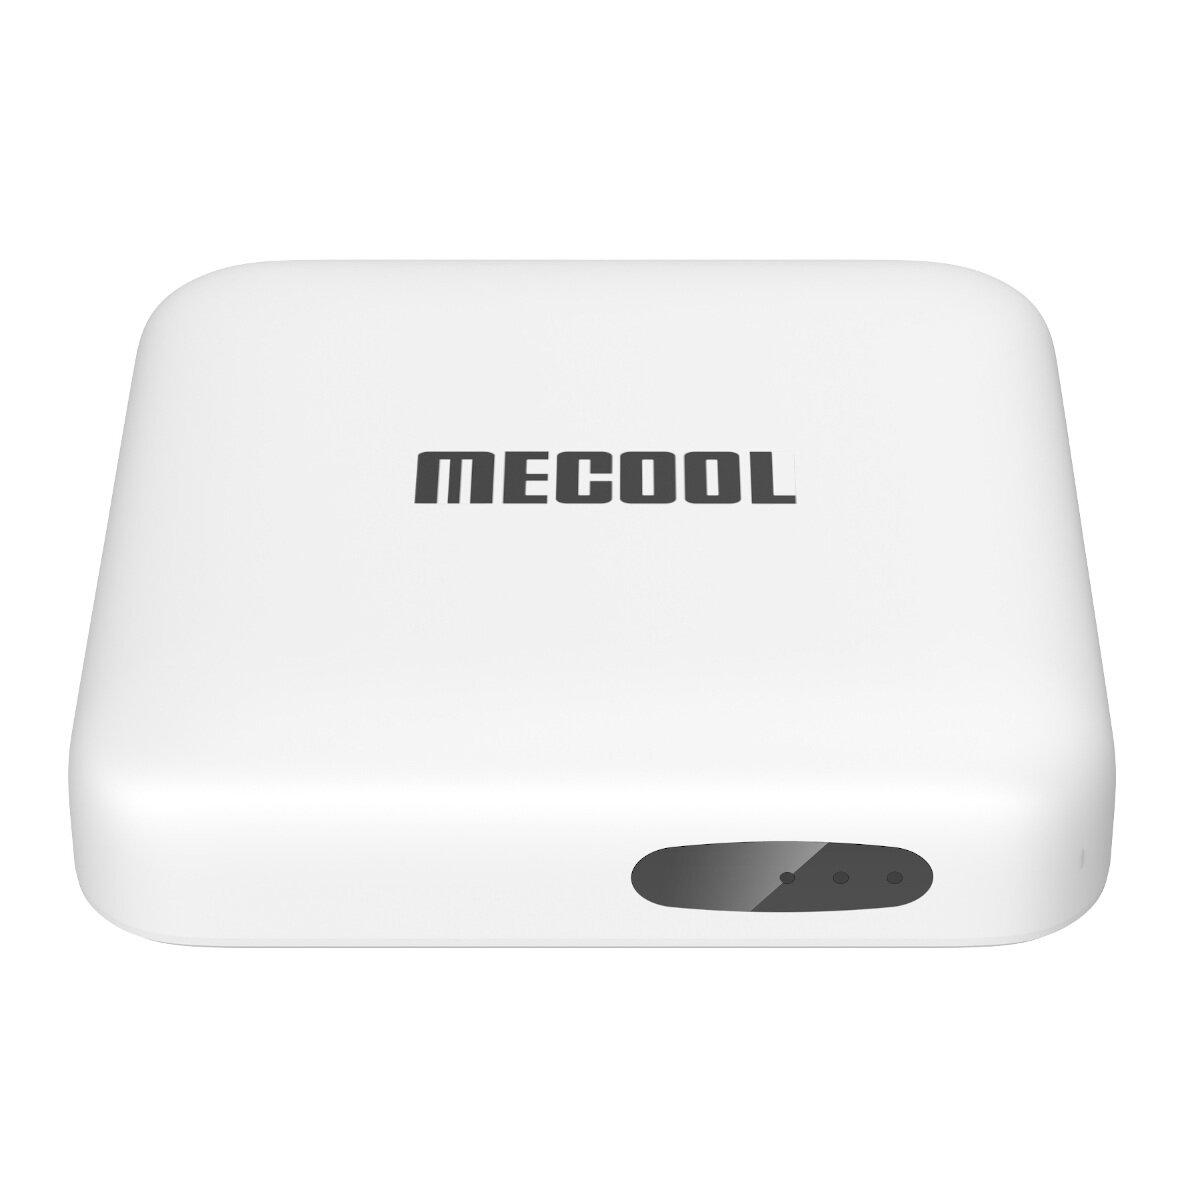 Banggood coupon: MECOOL KM2 Amlogic S905X2 Youtube Netflix 4K DDR4 2GB RAM 8GB eMMC ROM bluetooth 4.2 5G Wifi Android 10.0 4K HDR10 + TV